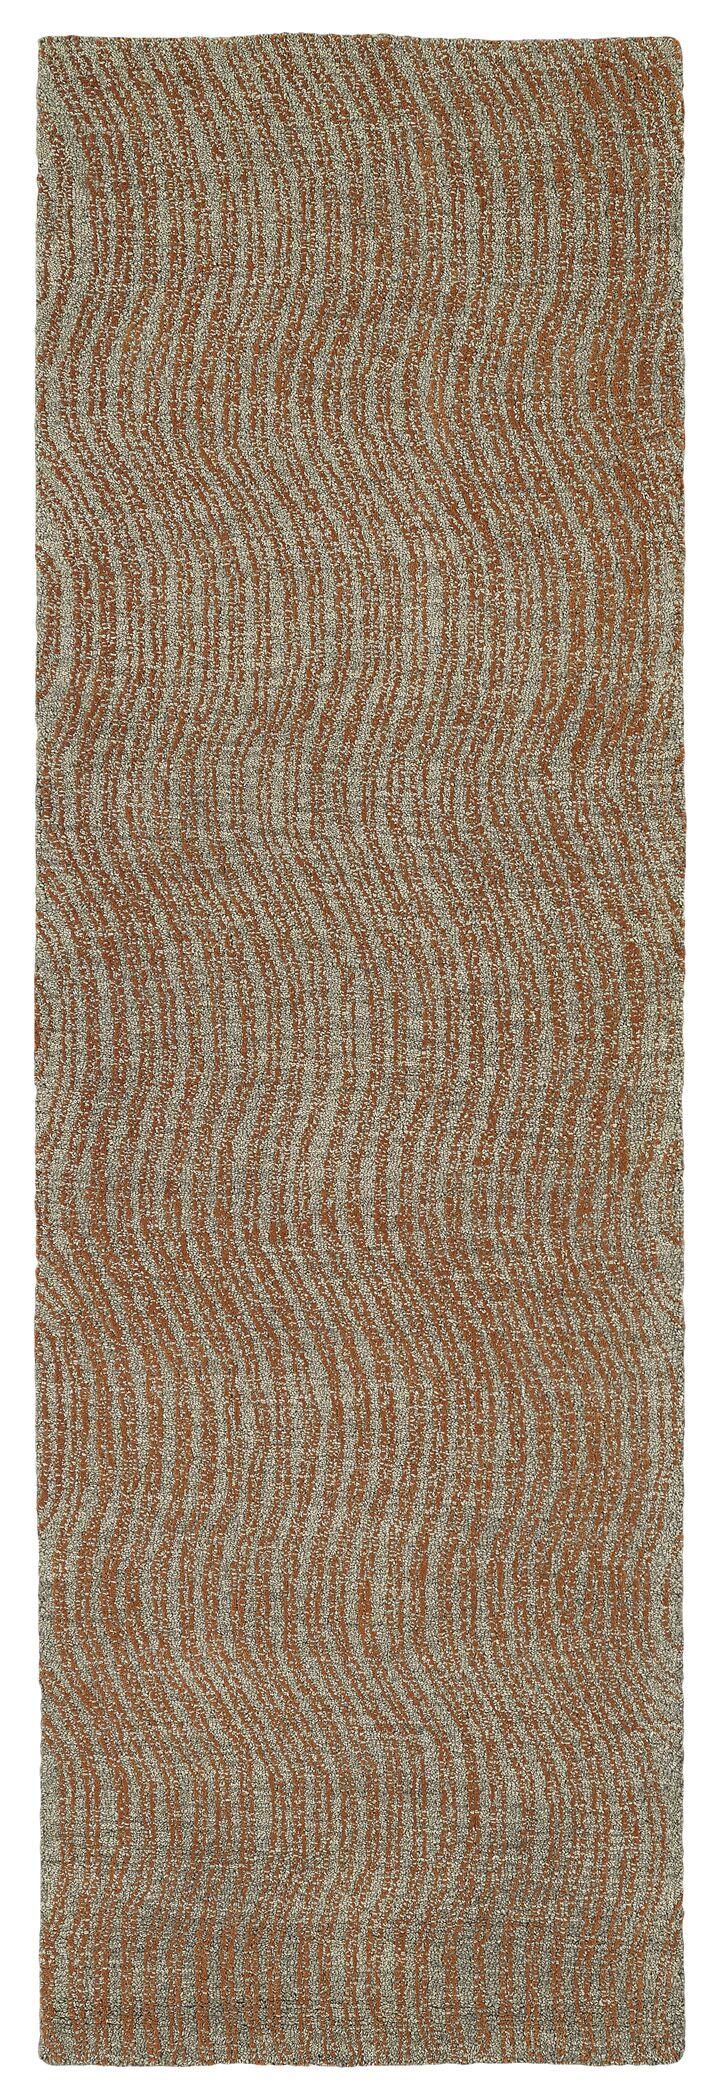 Caneadea Hand-Tufted Paprika Area Rug Rug Size: Runner 2'6